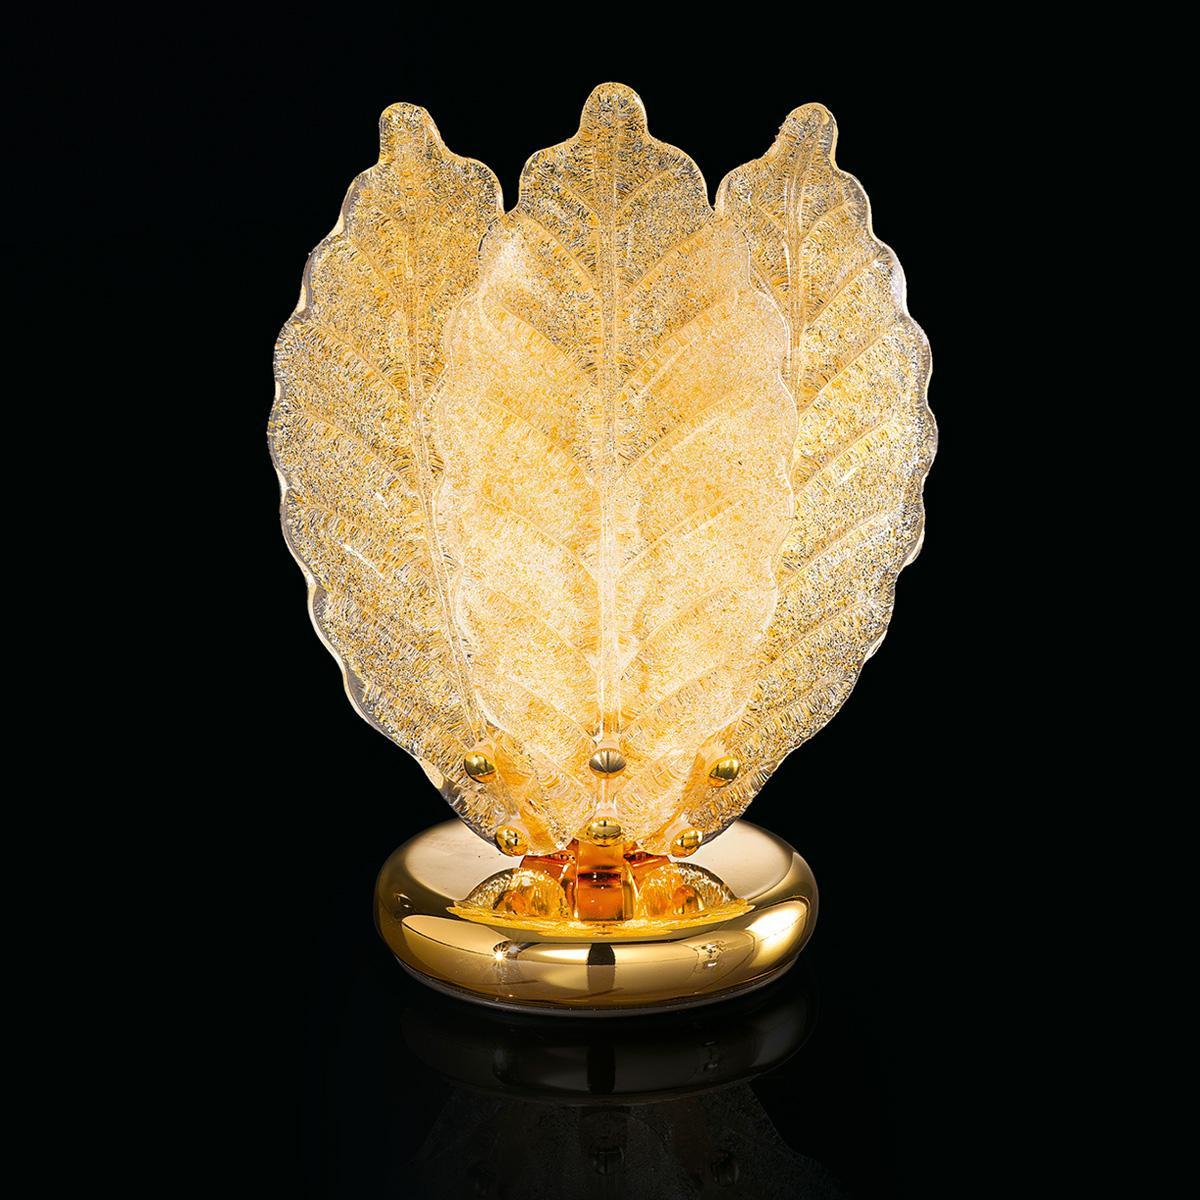 """Veneranda "" lampe de chevet en verre de Murano - 1 lumière - ""rugiada"" ambre"